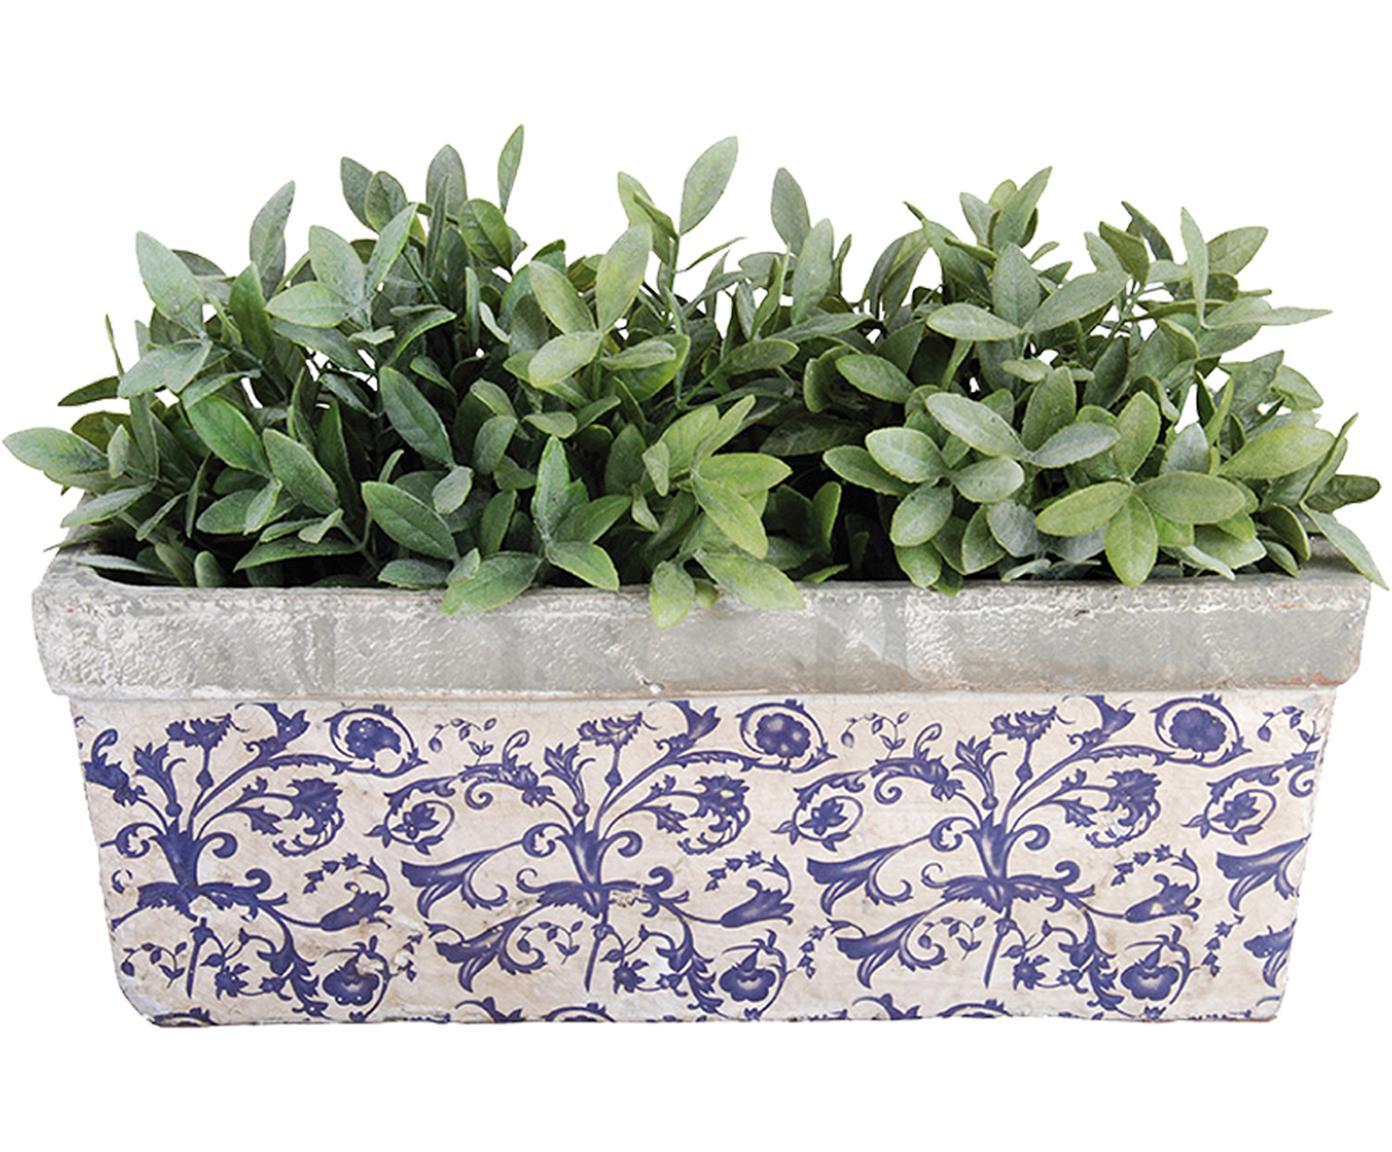 Übertopf Adela, Keramik, Blau, Grau, gebrochenes Weiß, 40 x 15 cm